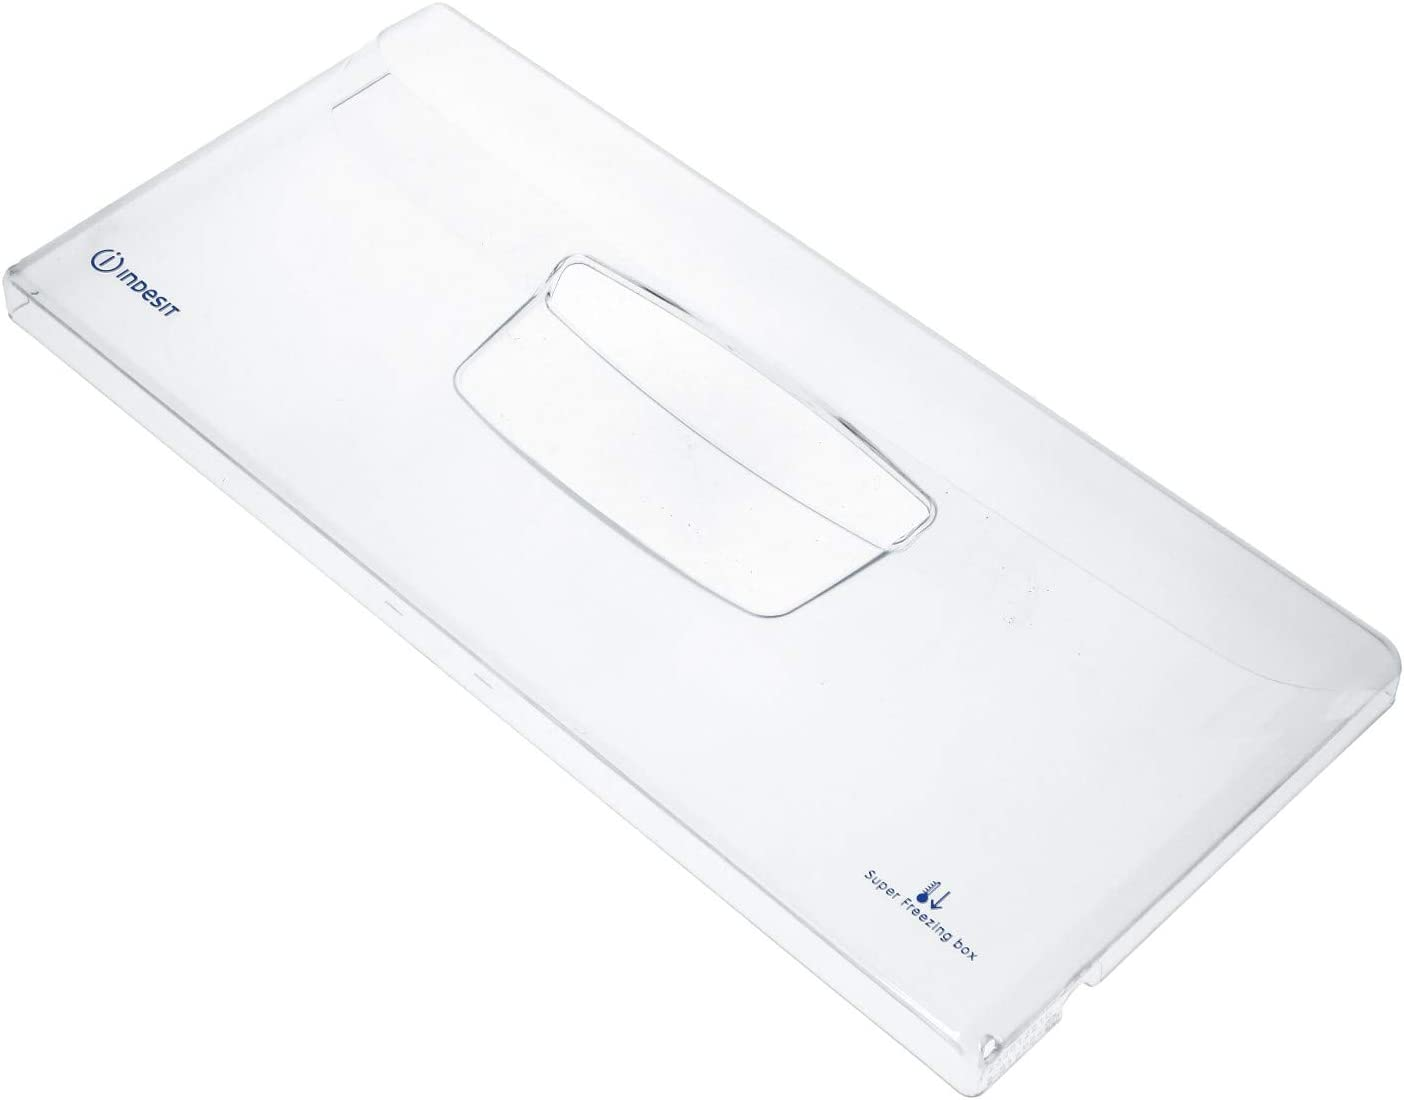 Congelador puerta Tapa Frigorífico Indesit c00291478, Whirlpool ...